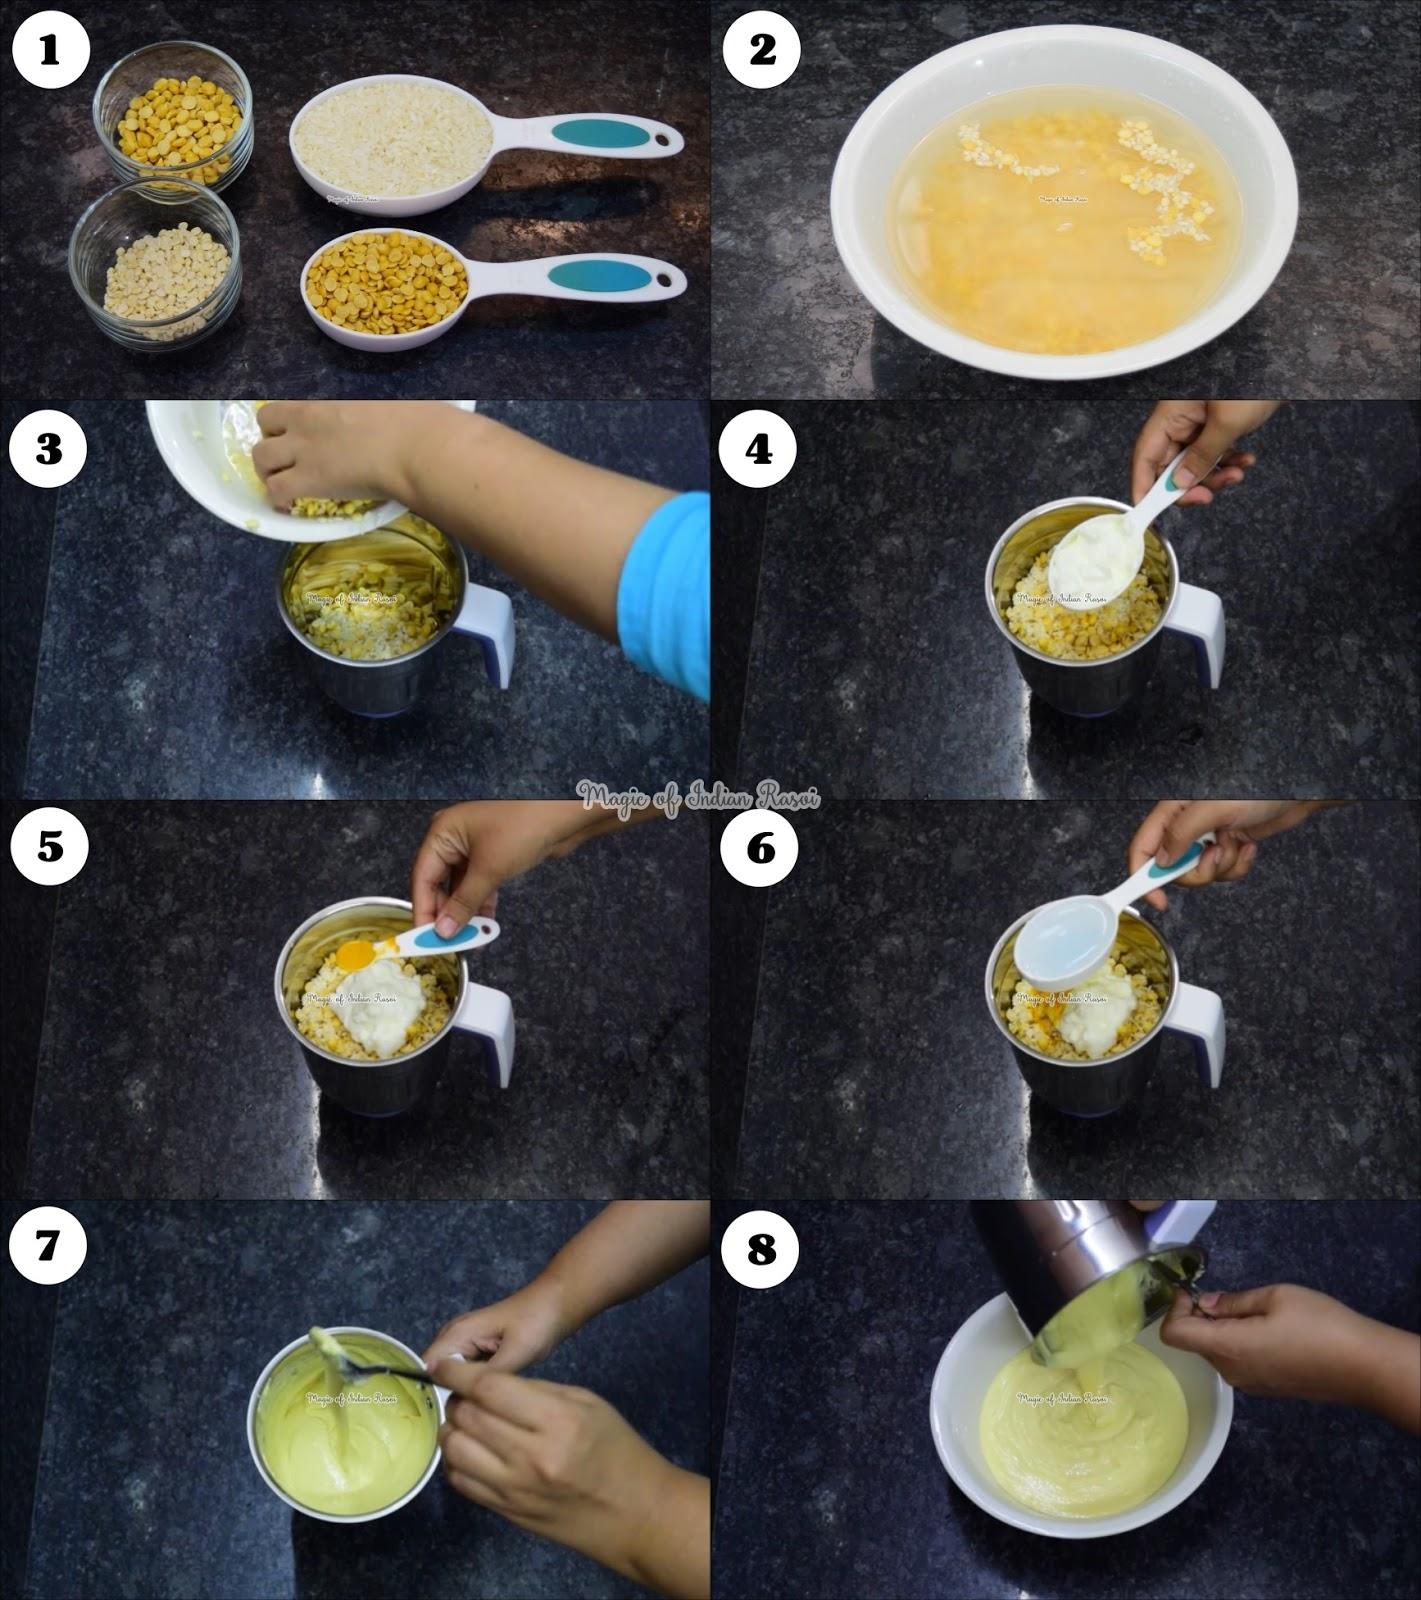 Gujarati Handvo in Pan/Without Oven Recipe - गुजराती हांडवो पैन मैं / बिना ओवन रेसिपी - Priya R - Magic of Indian Rasoi